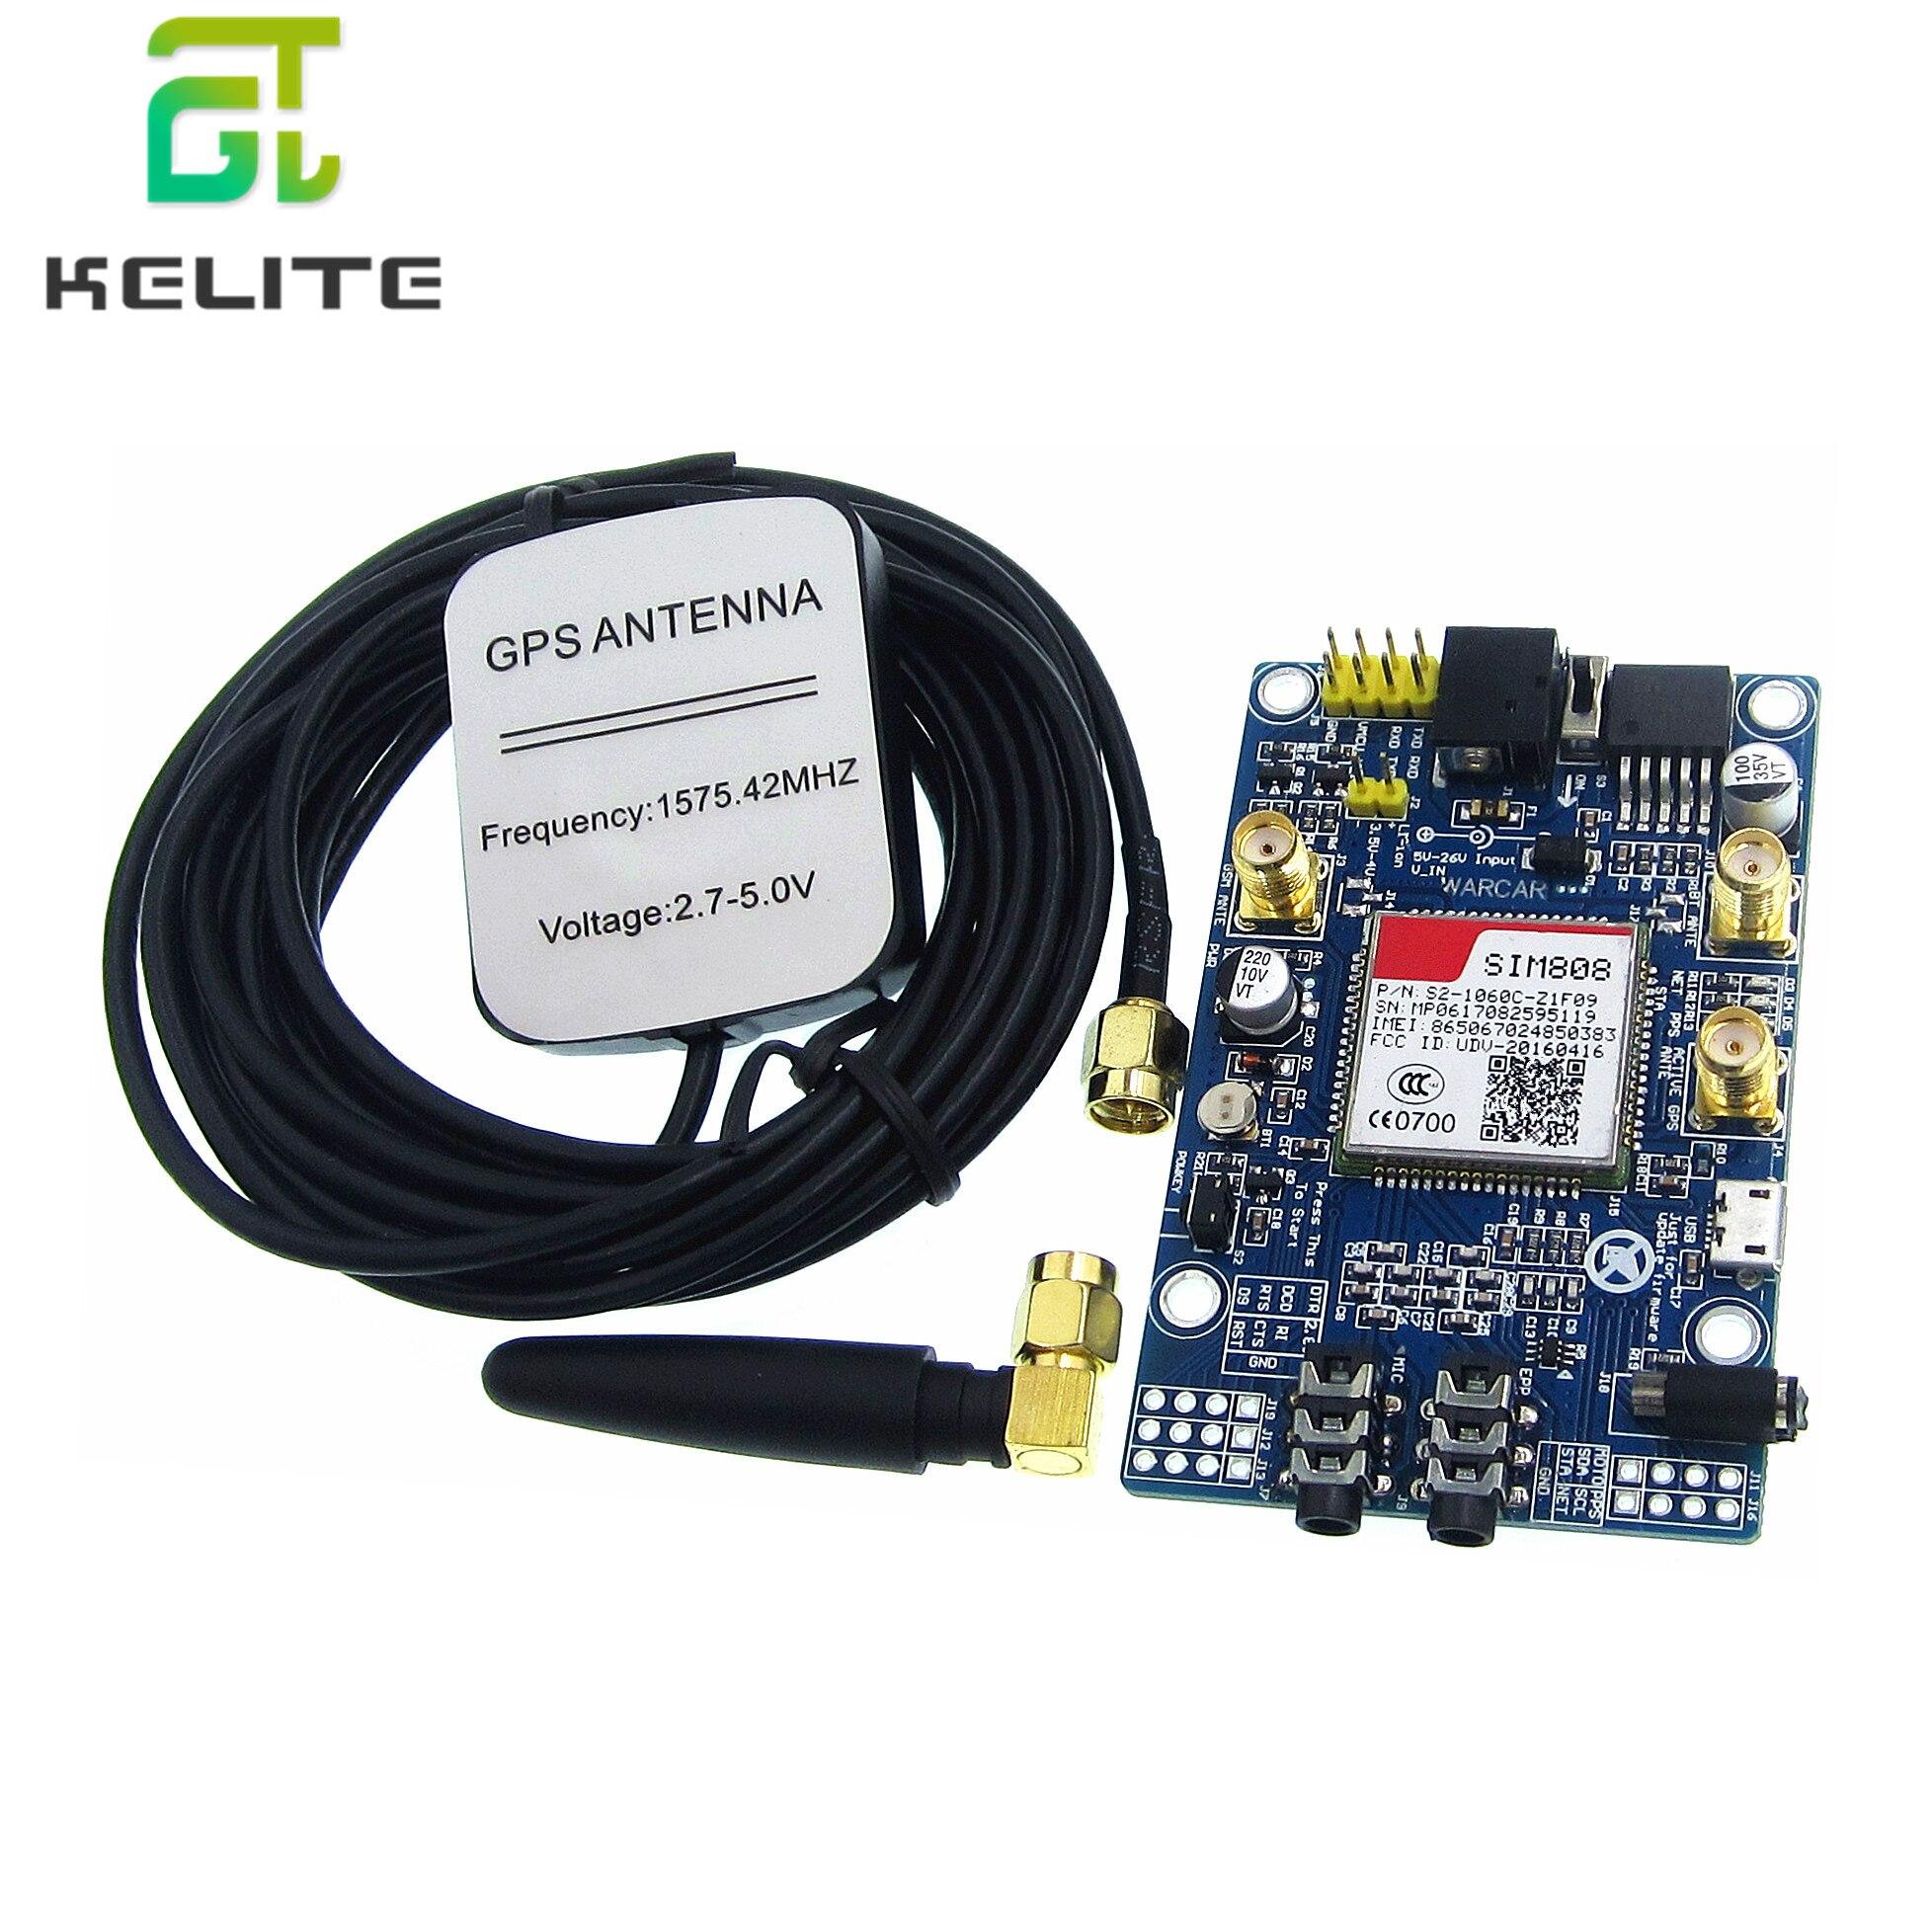 SIM808 Module GSM GPRS GPS Development Board IPX SMA Antenna Support 2G Network for Arduino Raspberry Pi